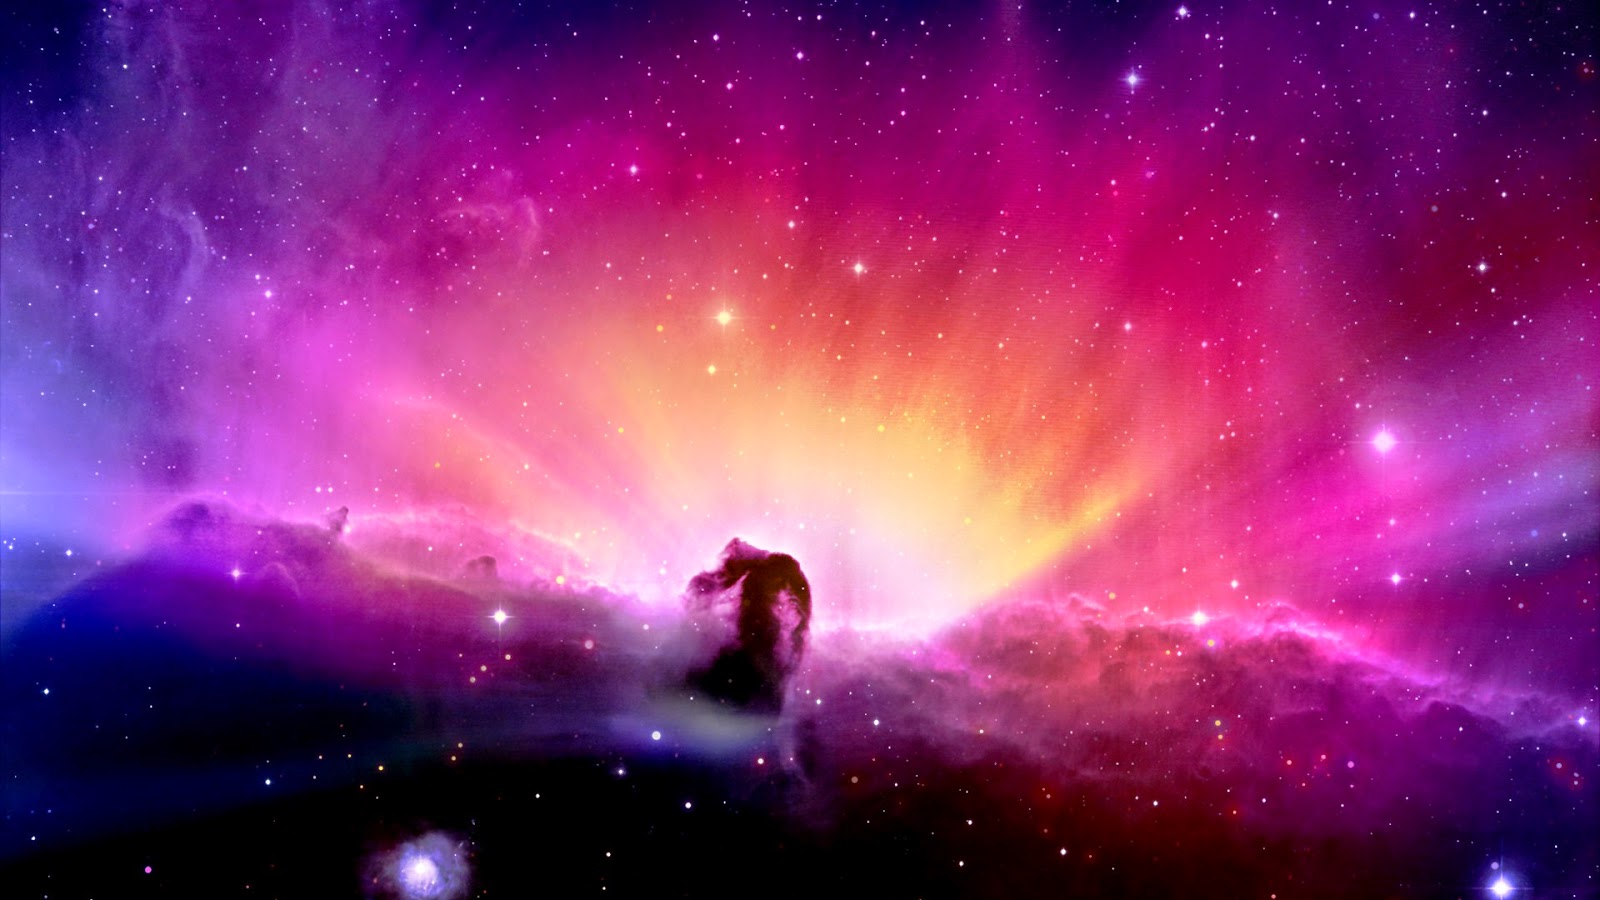 aurora borealis wallpaper hd,nebula,sky,atmosphere,purple,violet